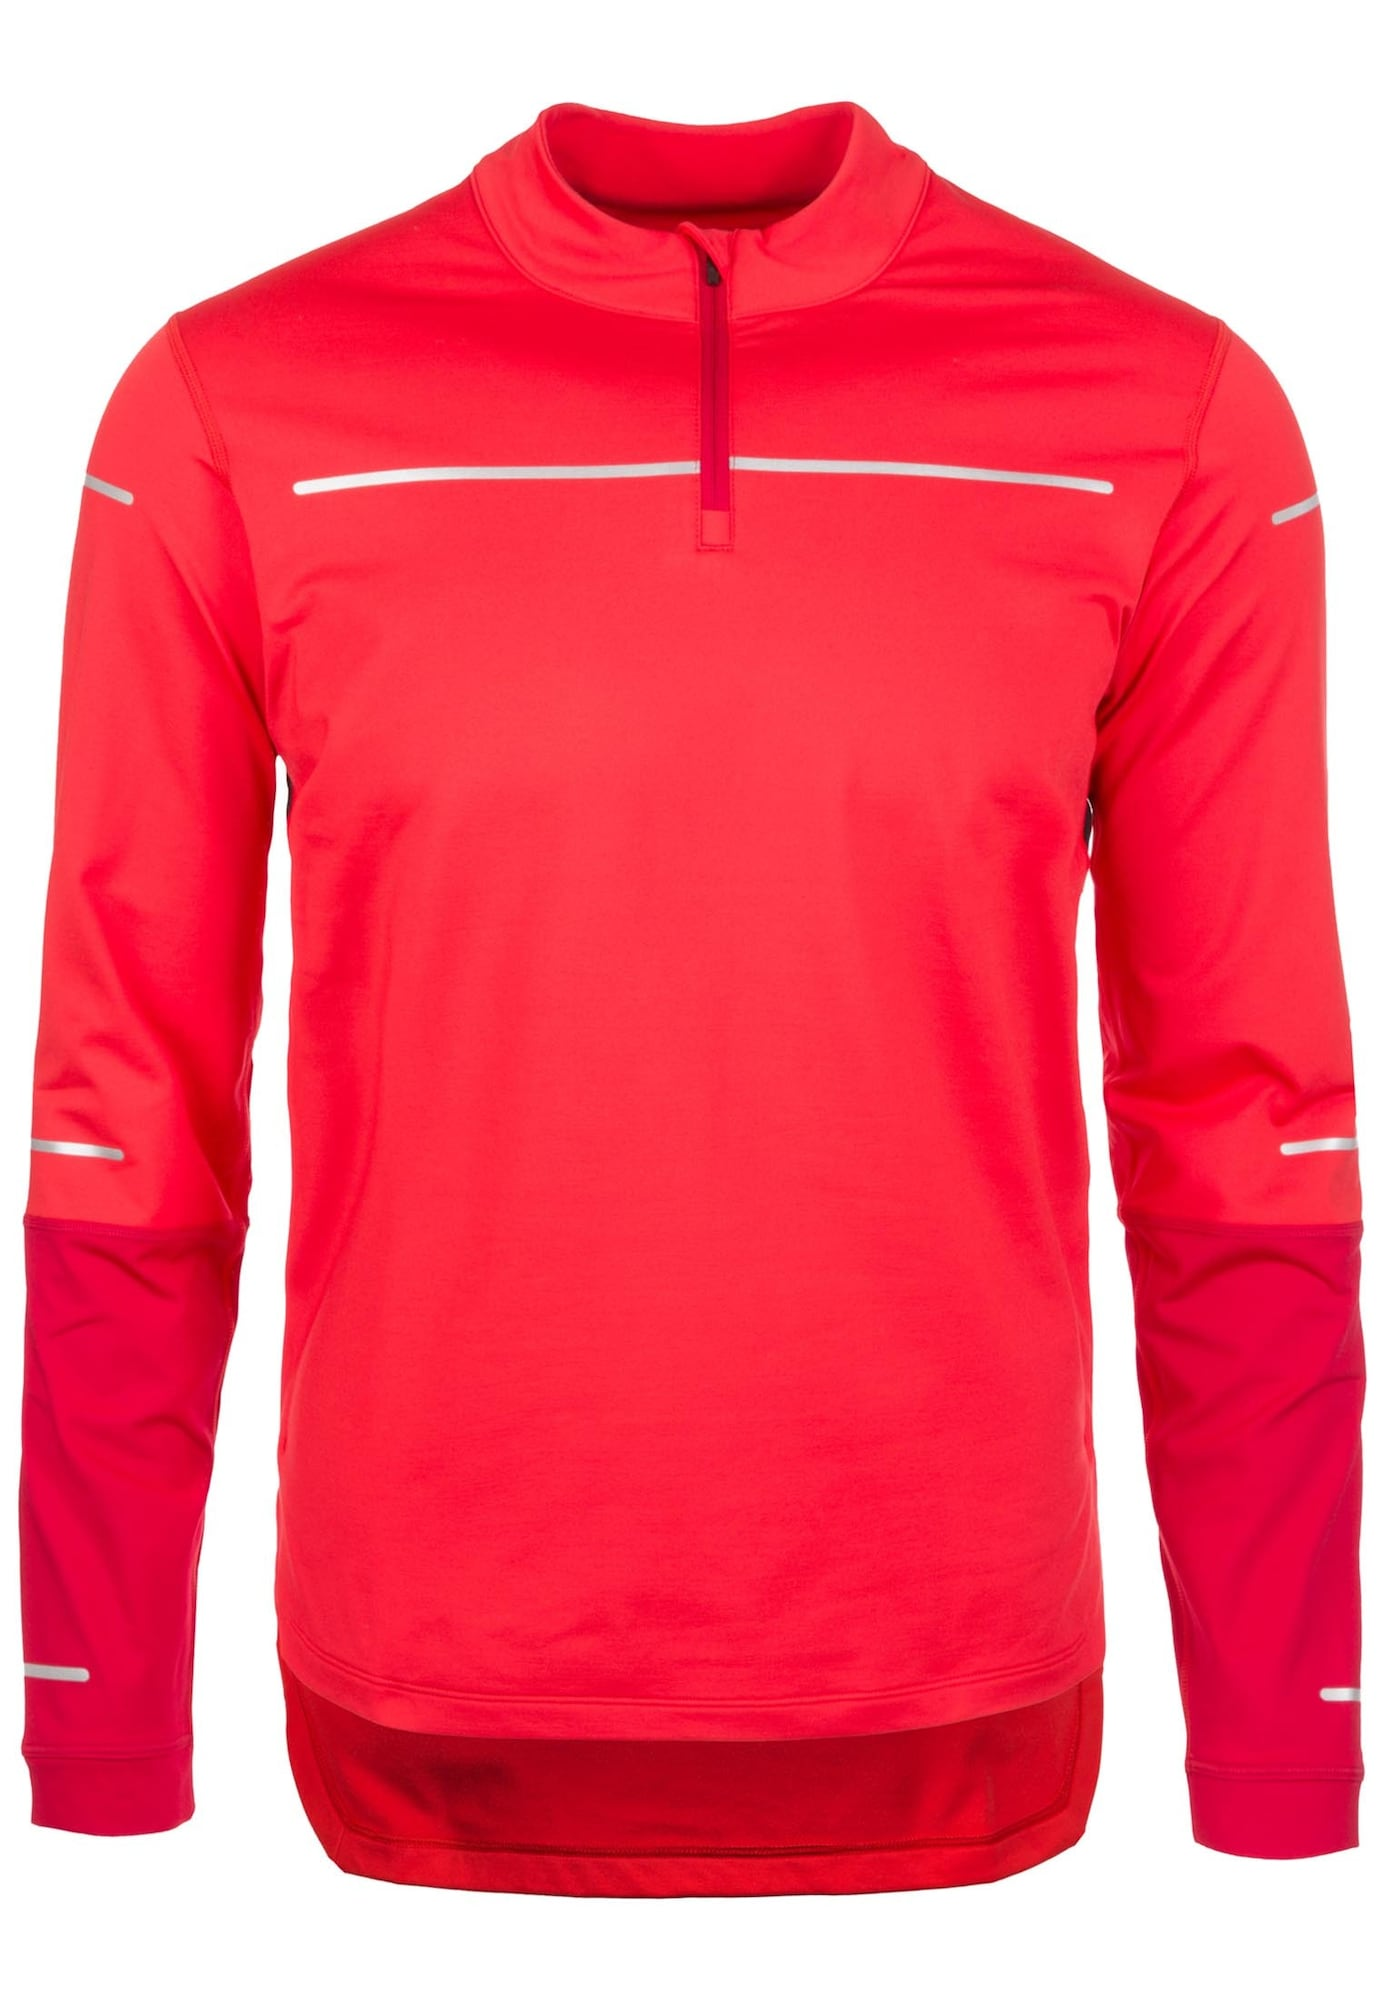 Laufshirt 'Lite-Show' | Sportbekleidung > Sportshirts > Laufshirts | Rot | ASICS